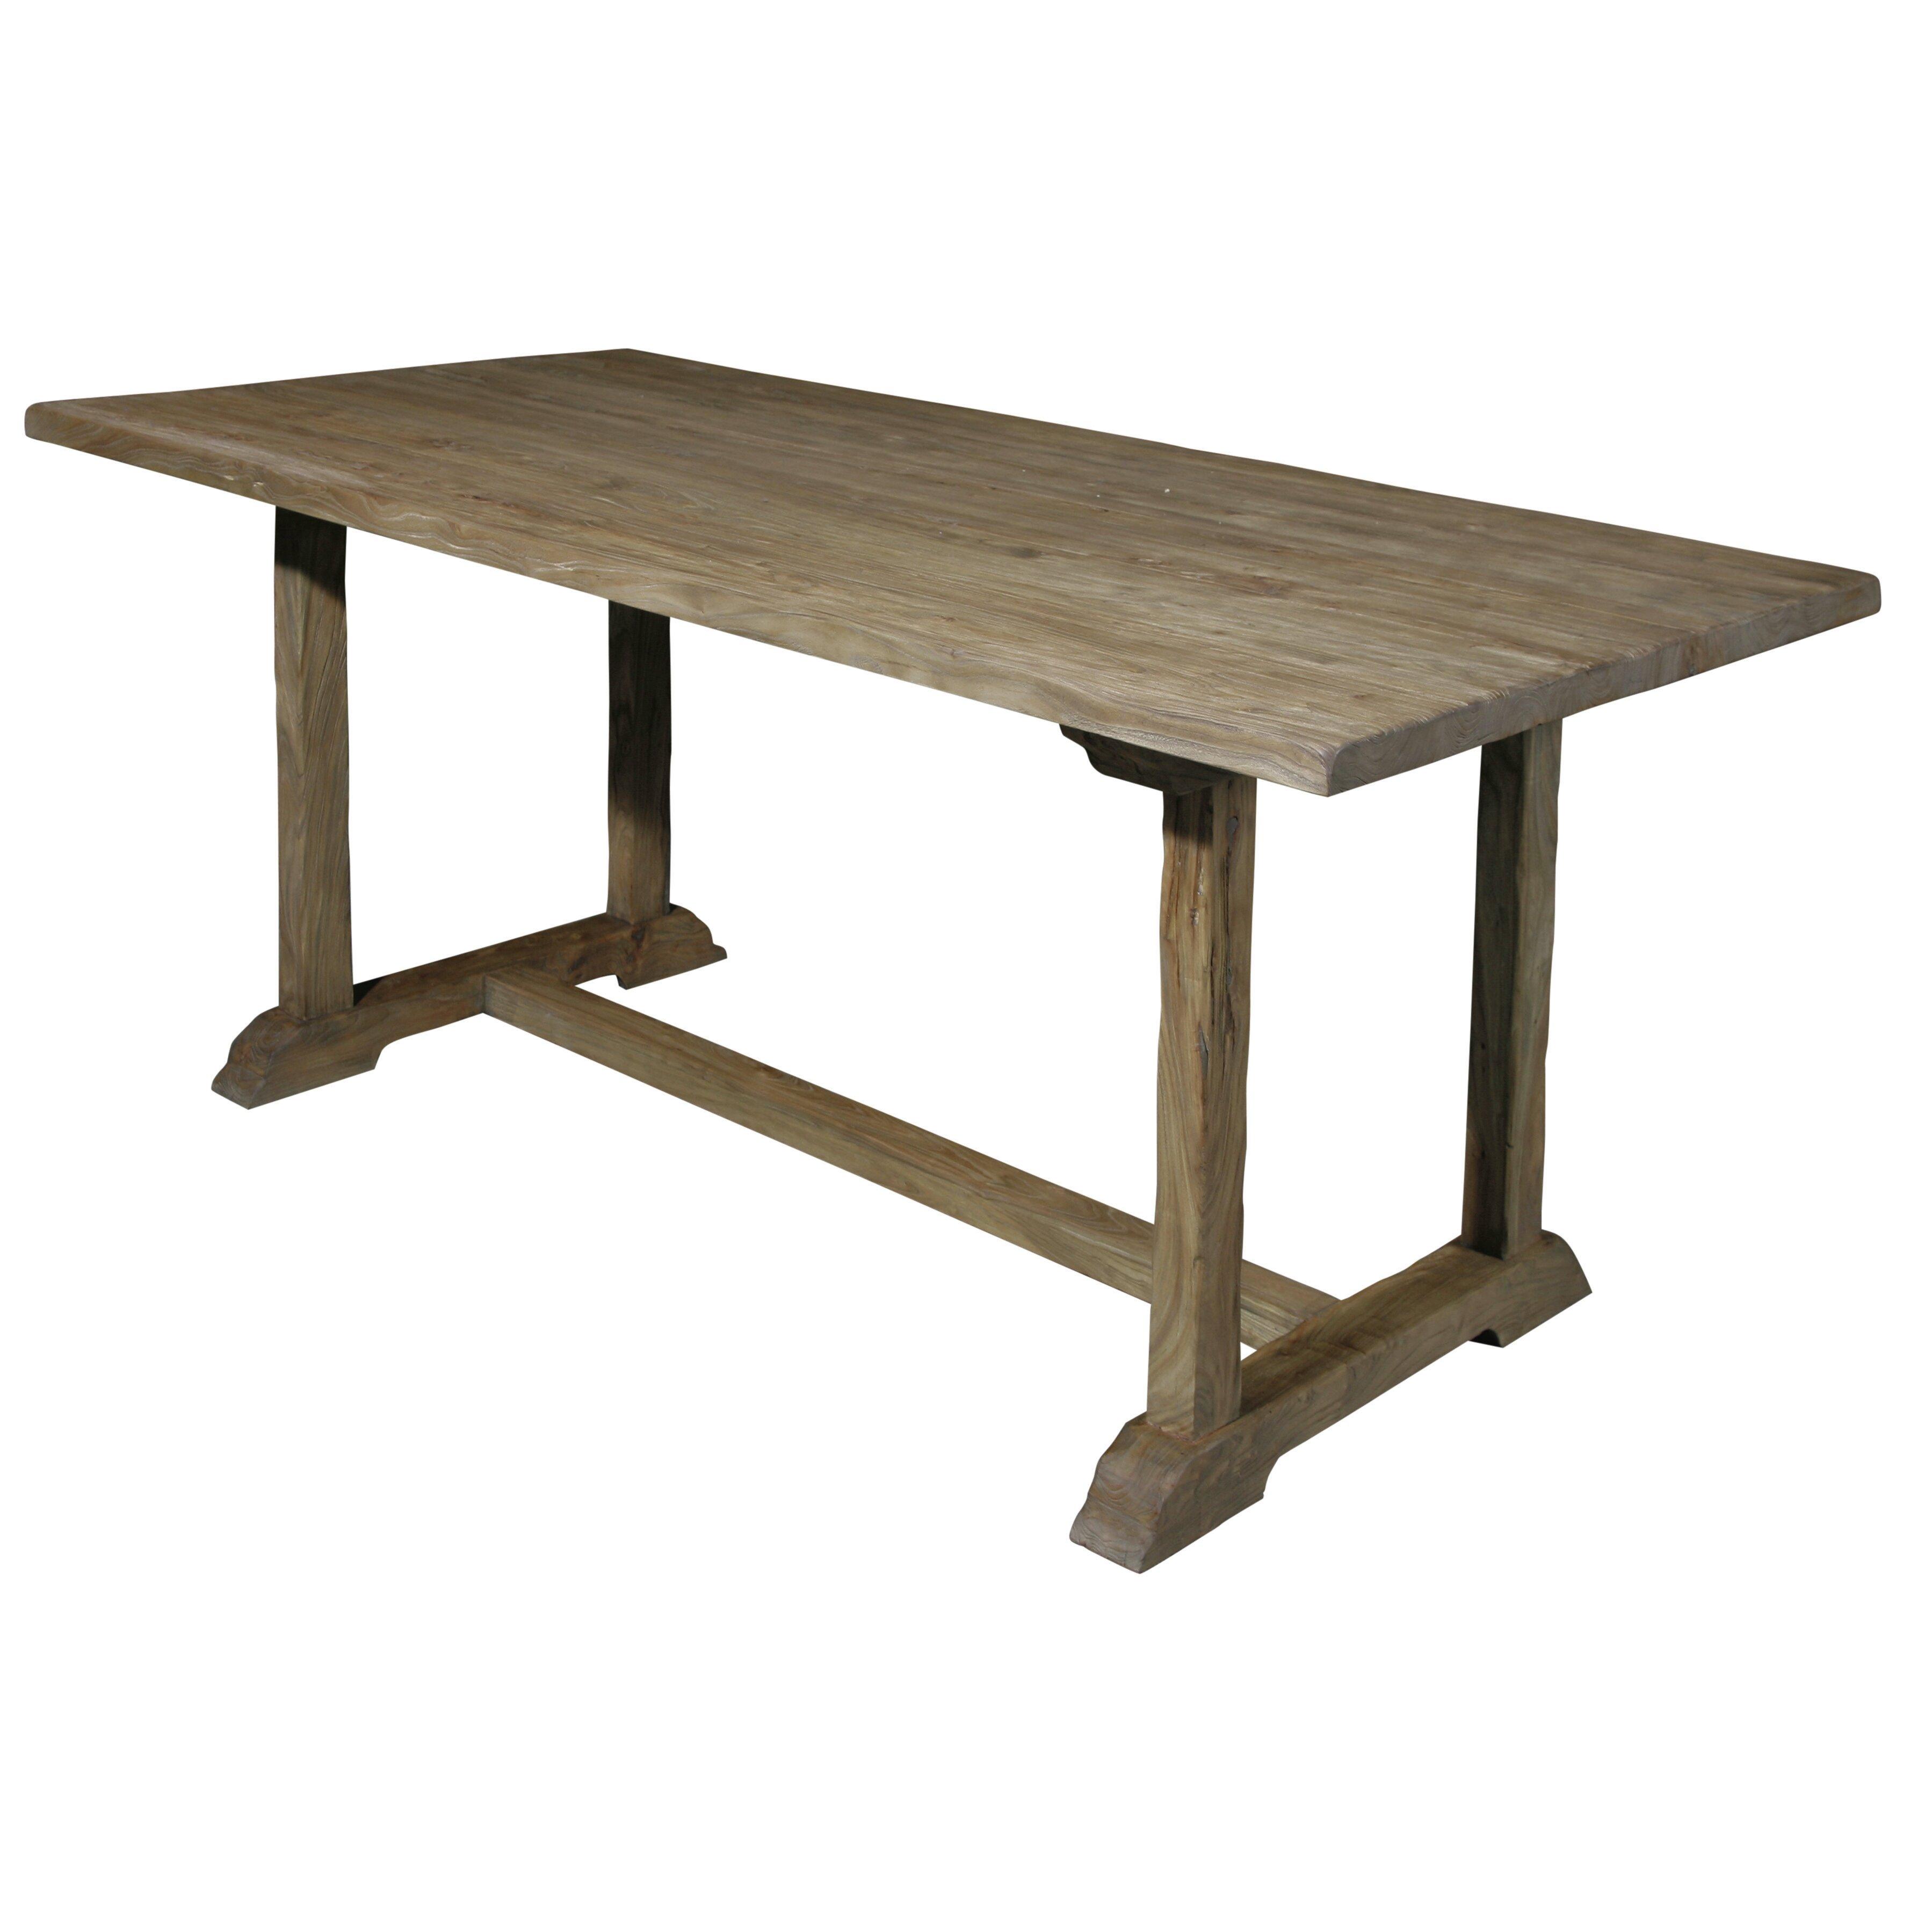 Dining table wayfair for Furniture 2 inspire ltd